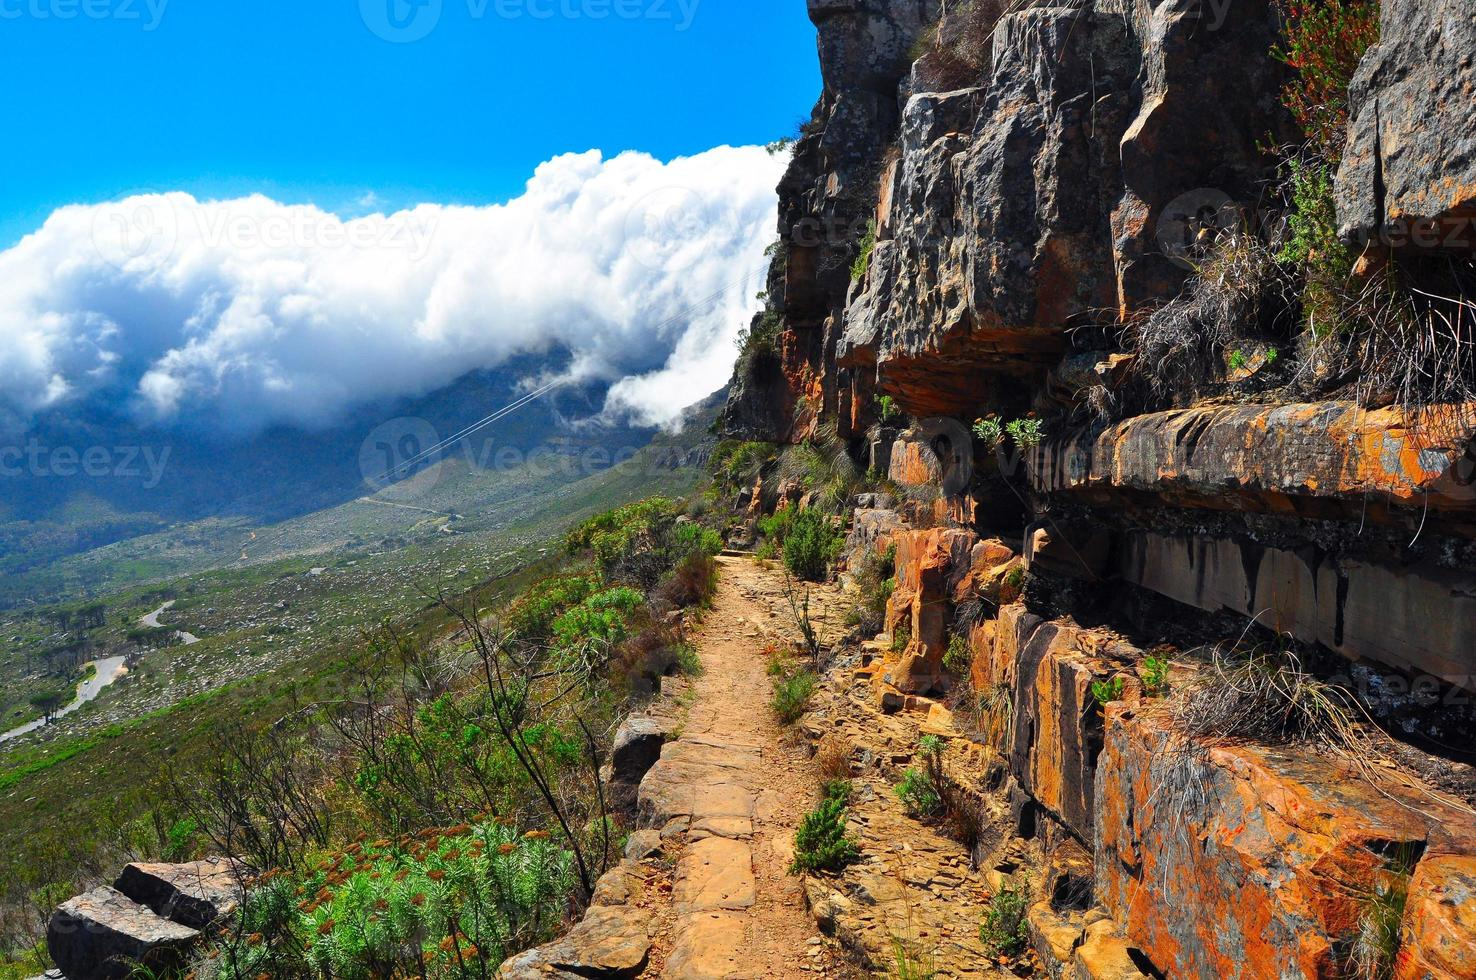 trilha de mesa montanha foto